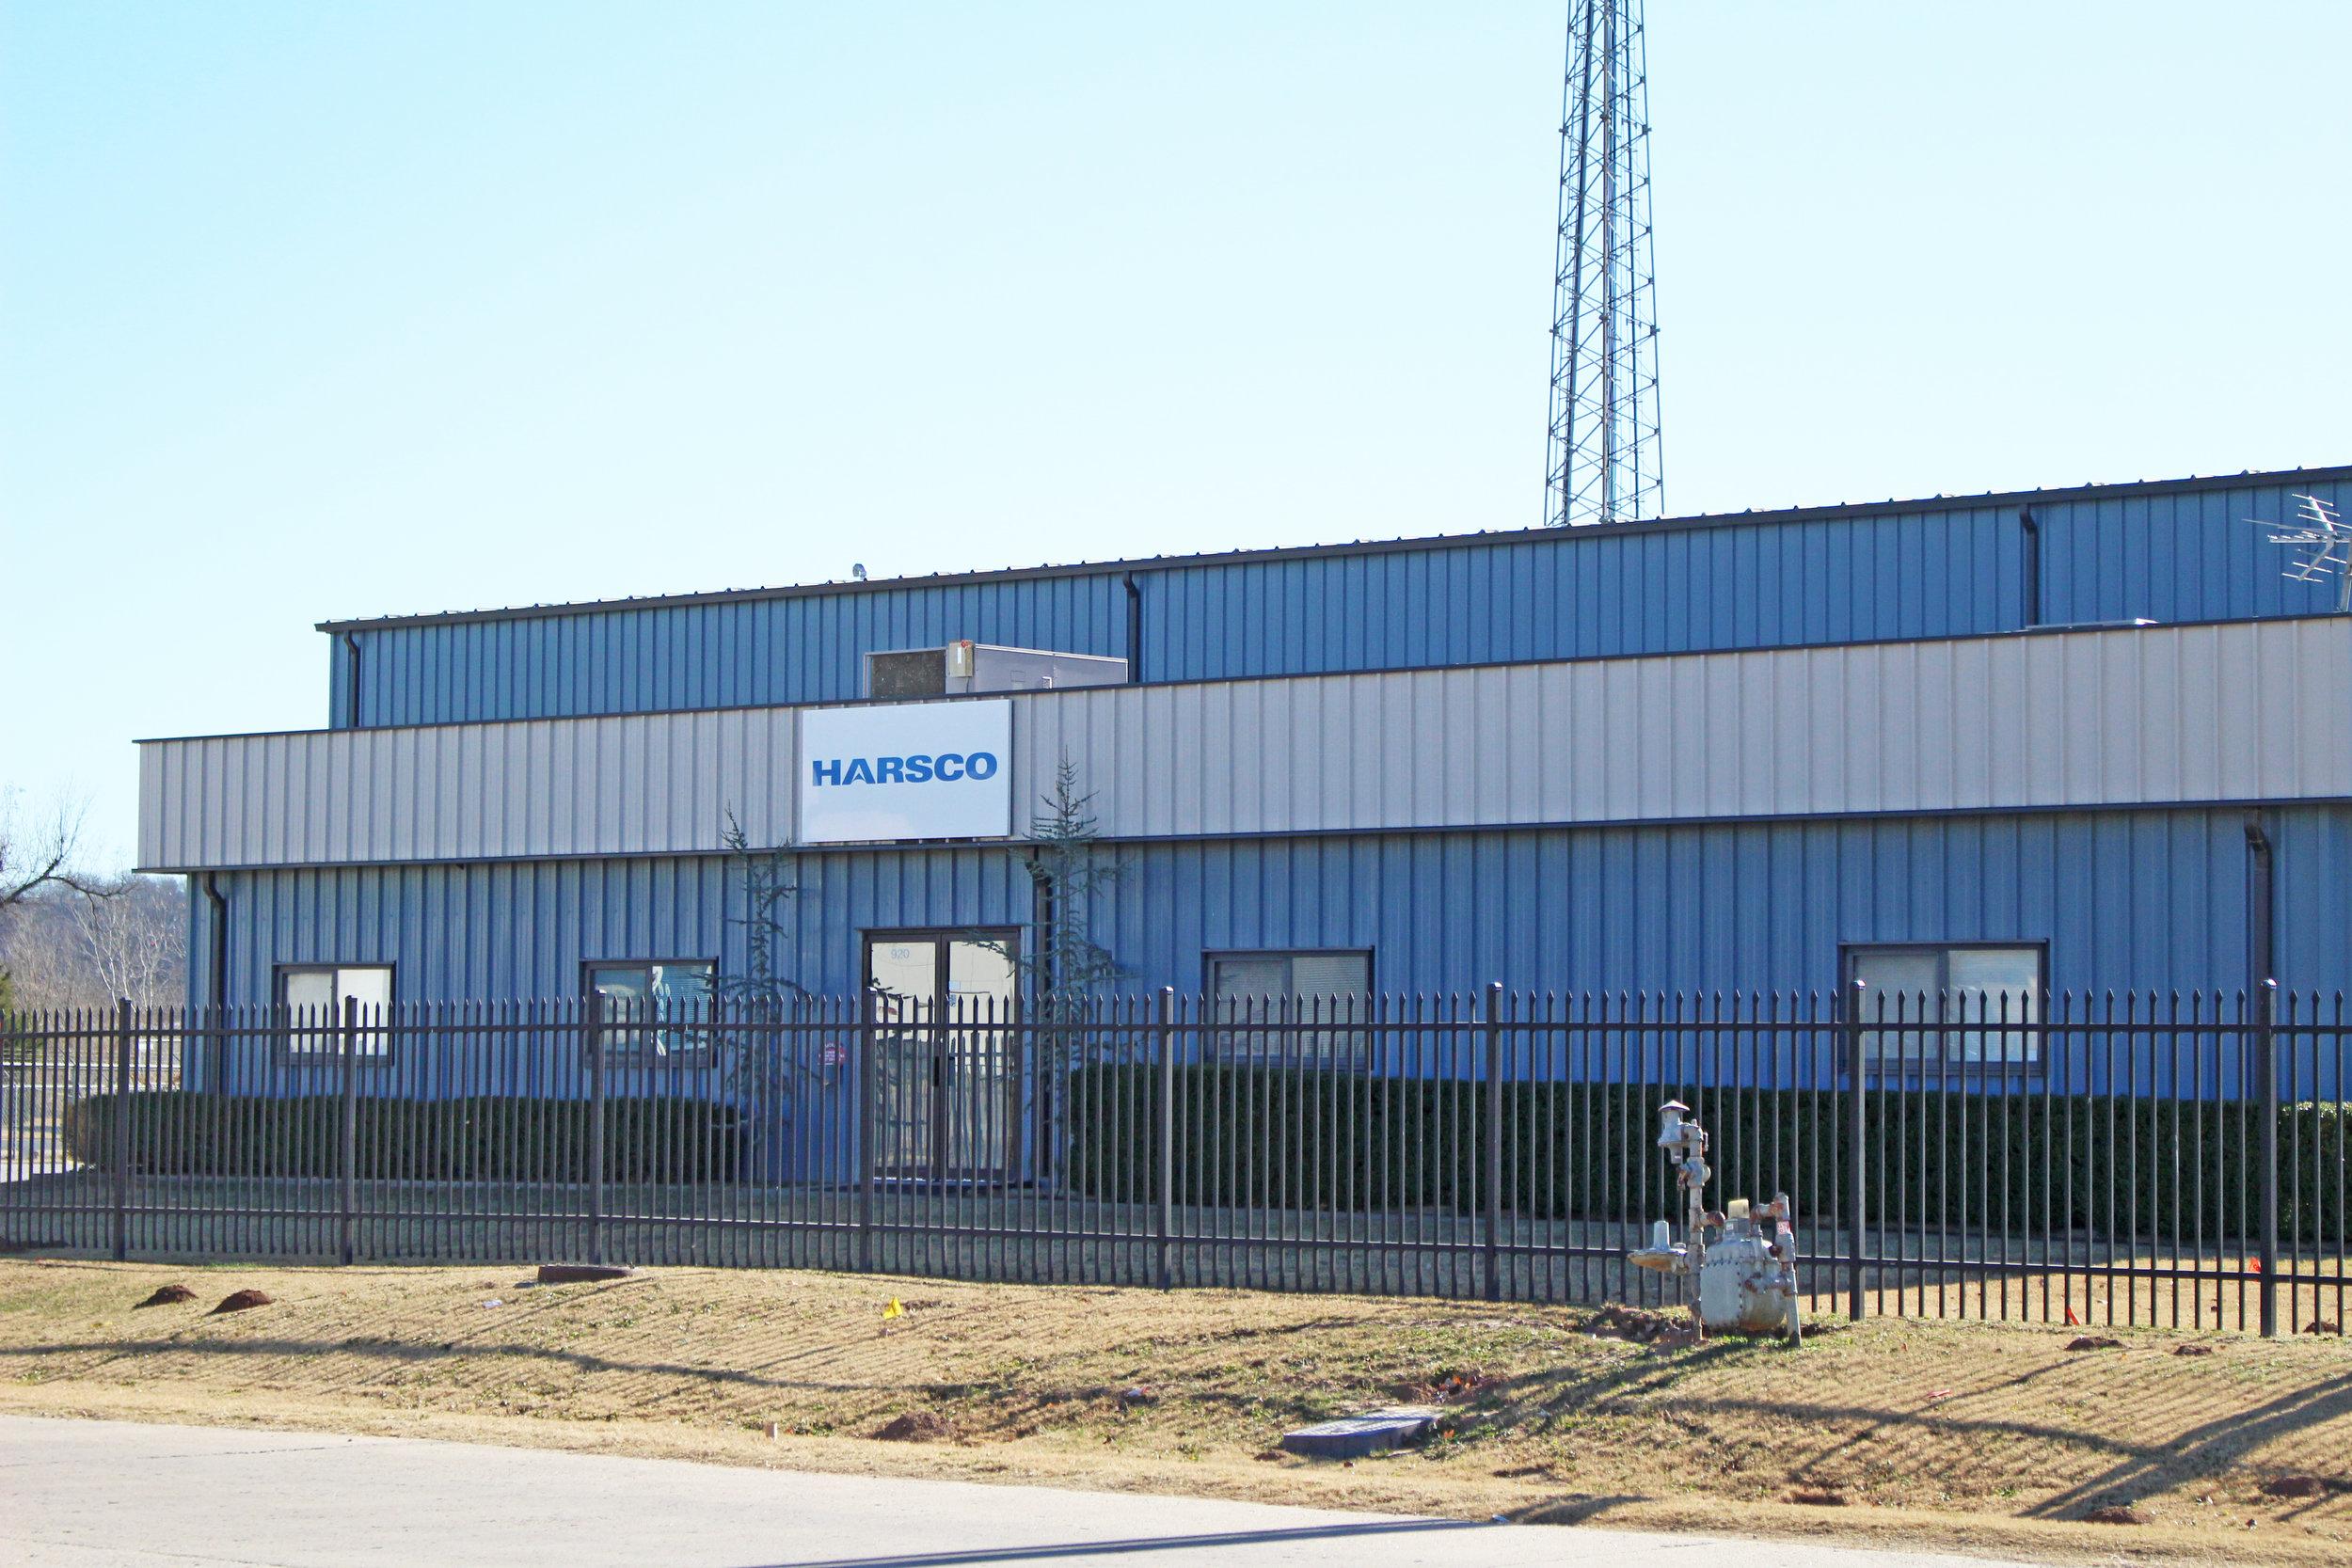 Harsco industrial ikg 920 east pecan street